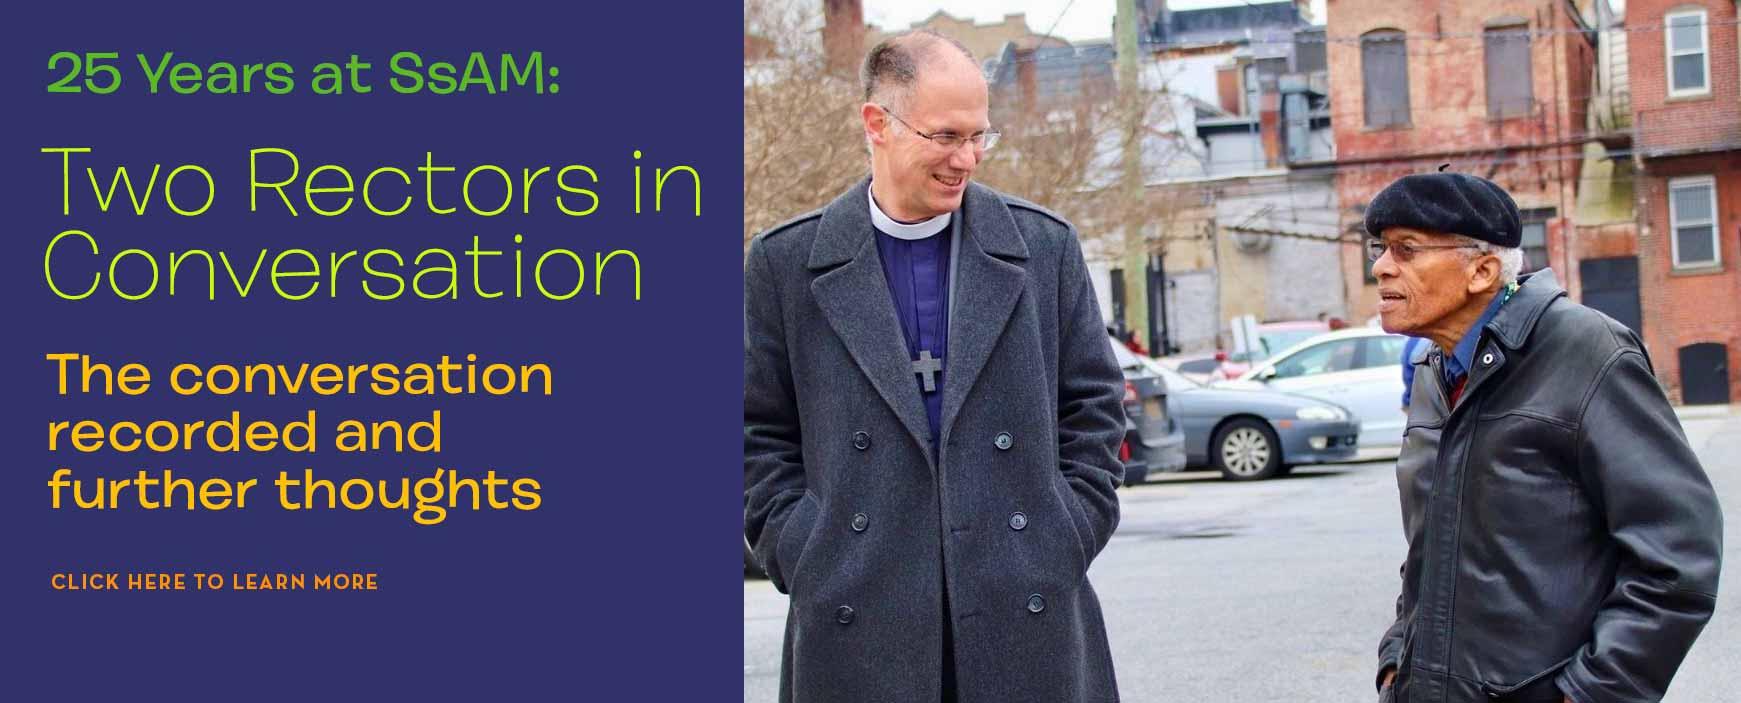 Rectors In Conversation, Sunday, October 24, 2021